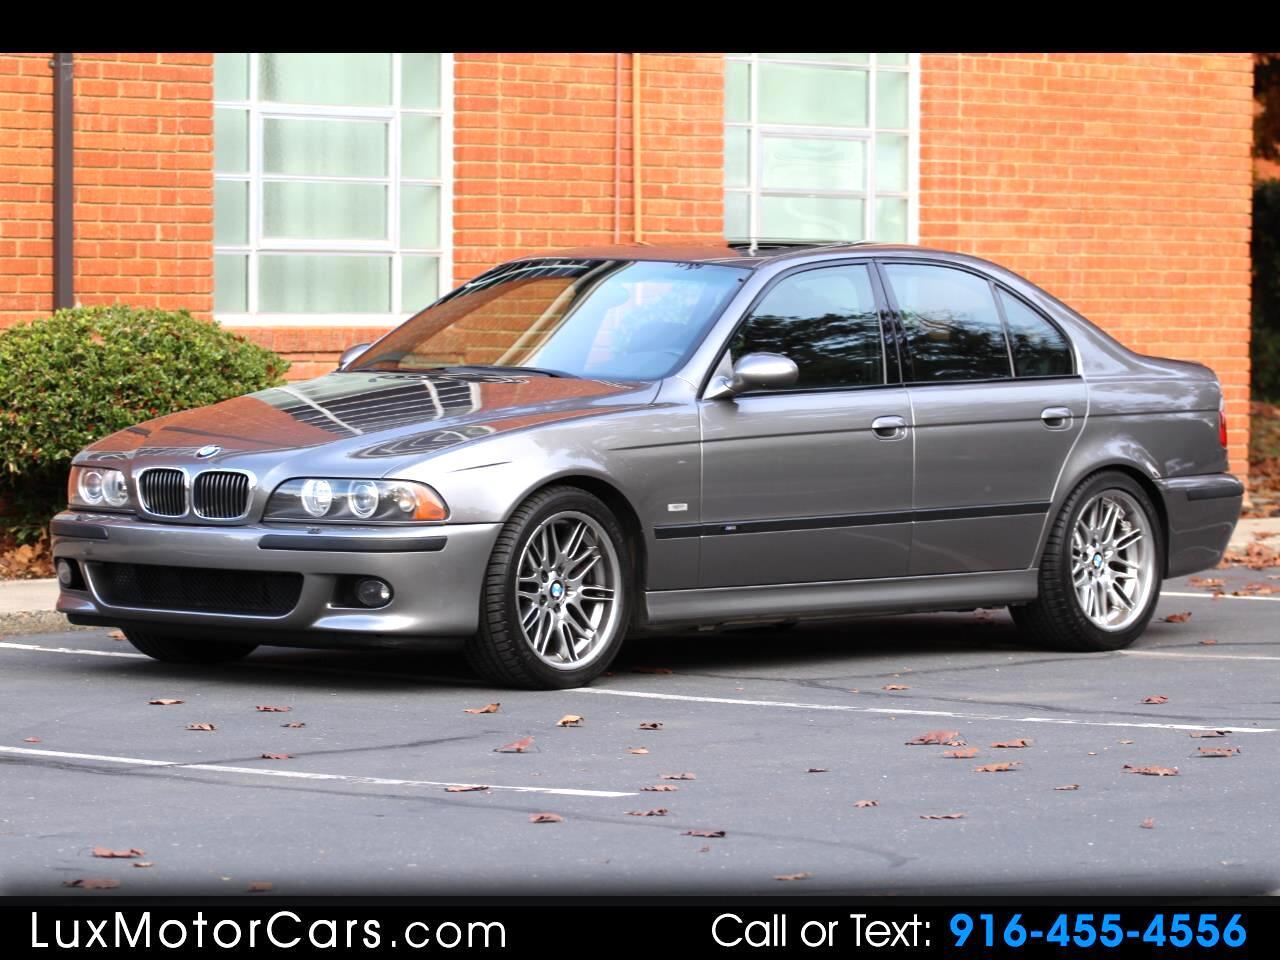 2002 BMW M5 4dr Sdn